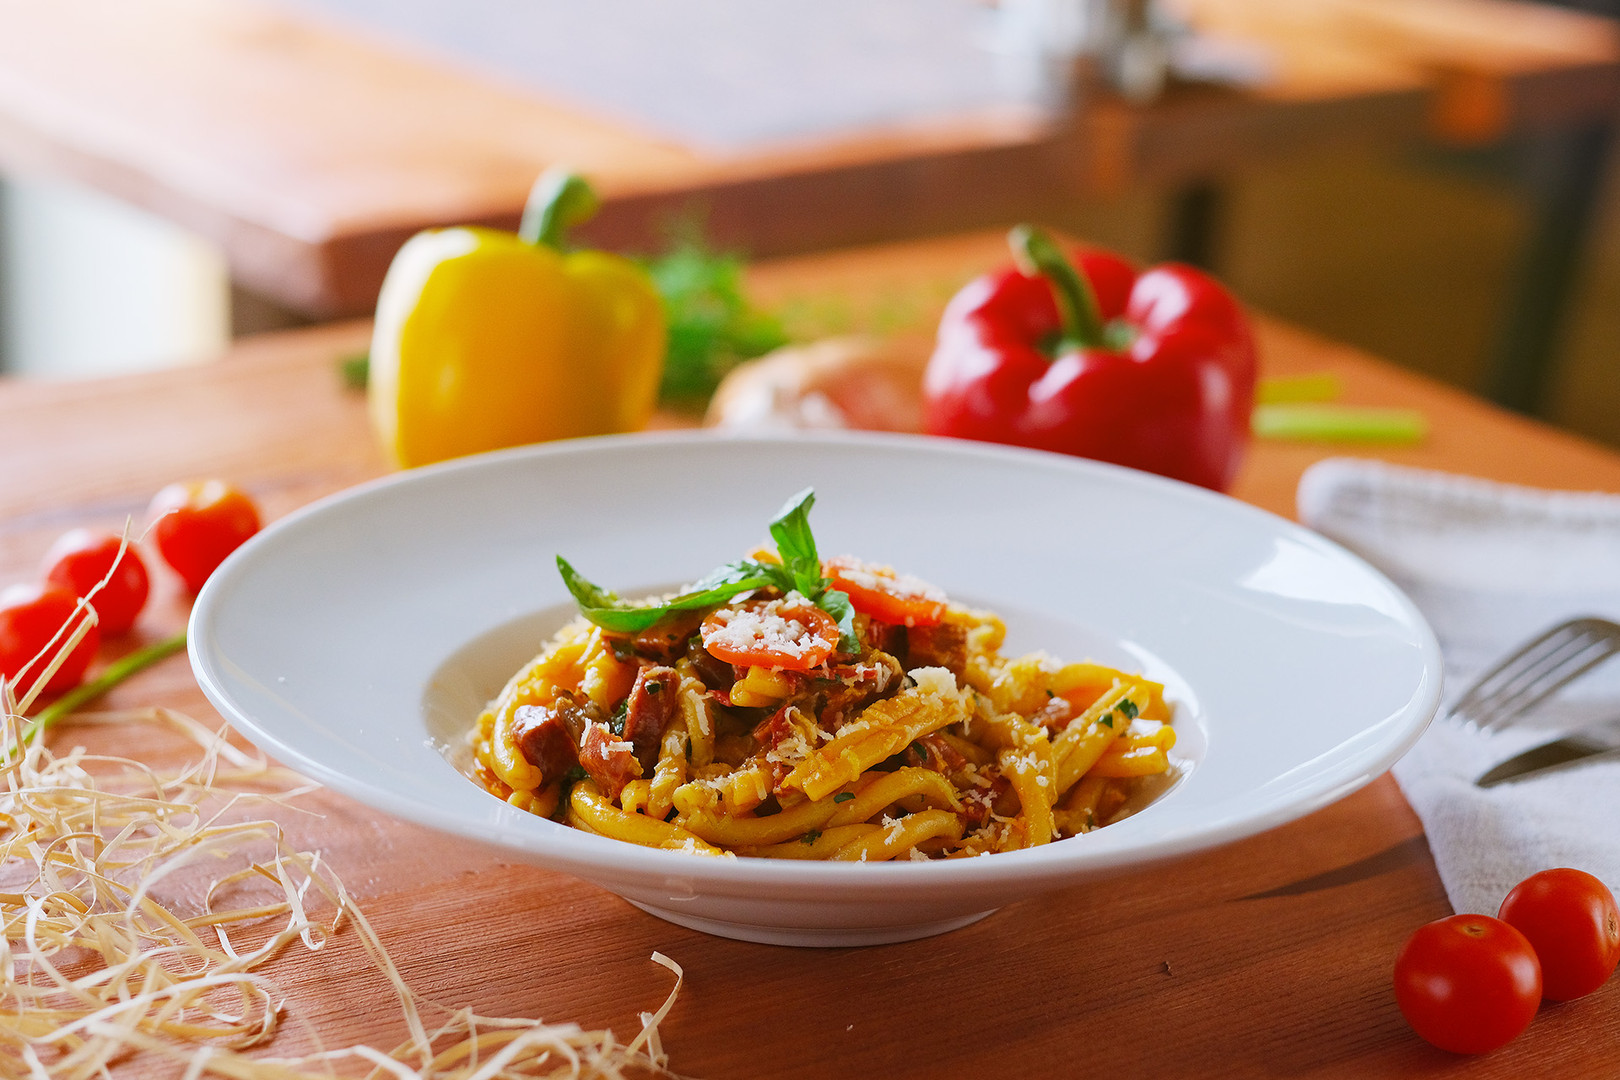 5. Cestoviny s hubami, talianskou klobásou (Saliccou) a syrom Peccorino